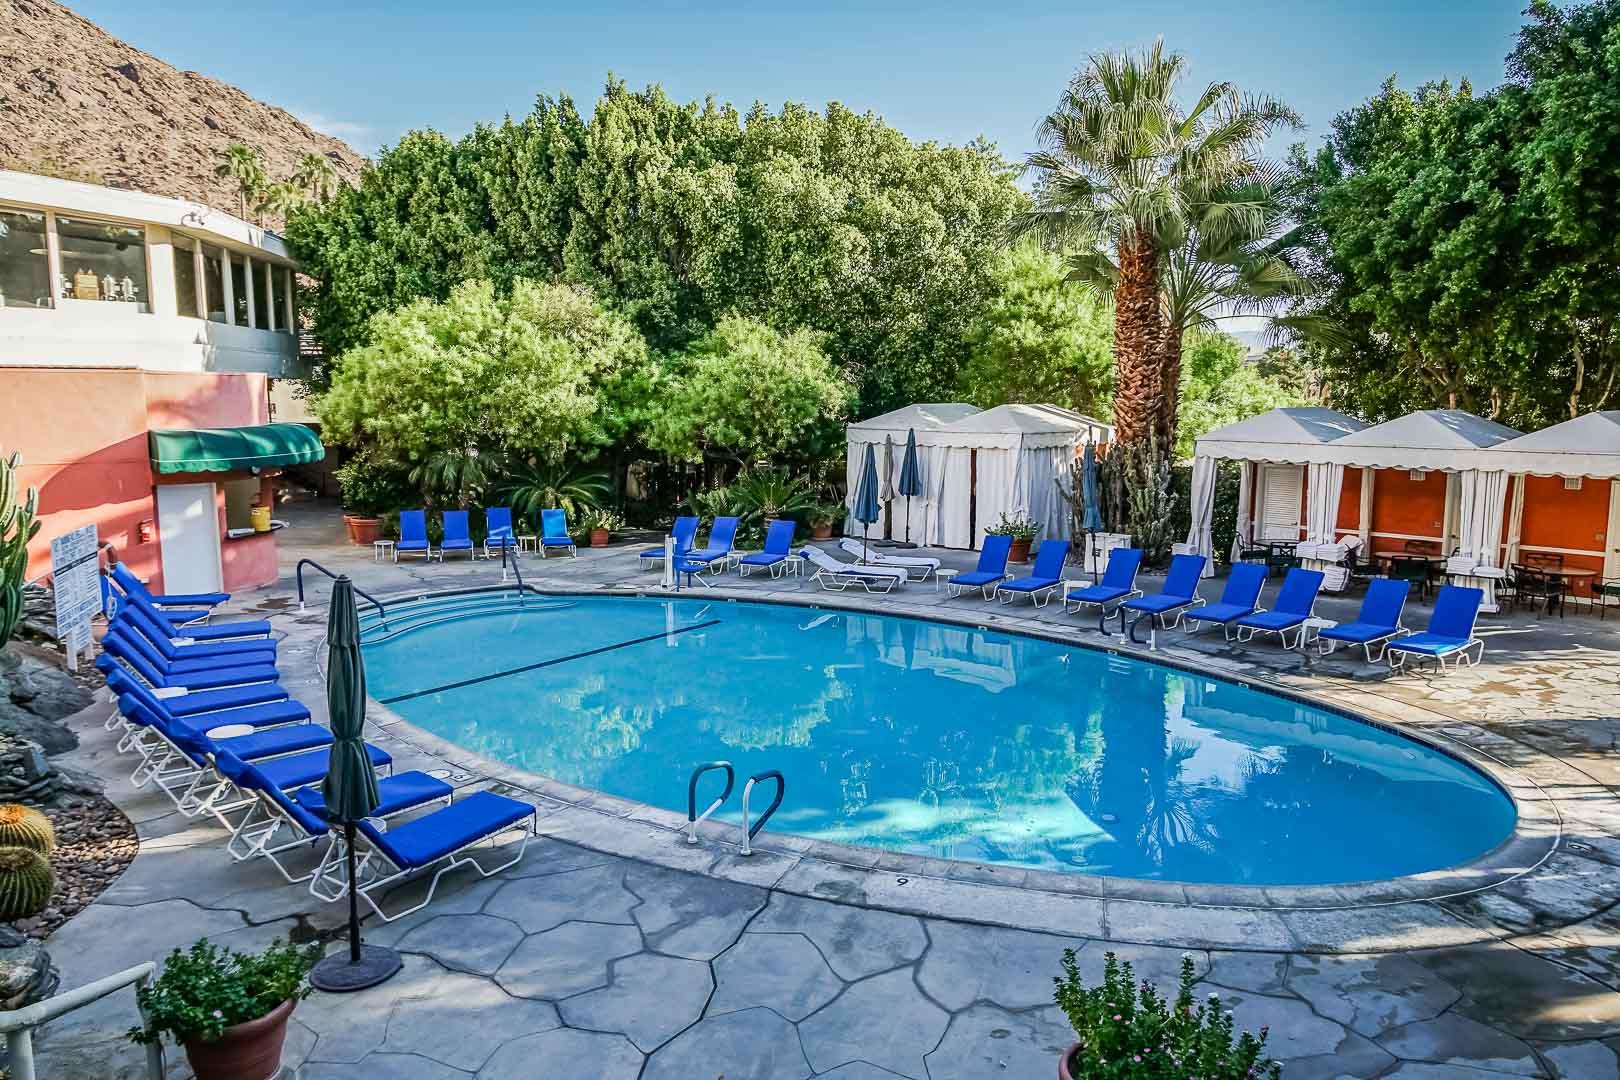 A crisp outdoor swimming pool at VRI's Palm Springs Tennis Club in California.